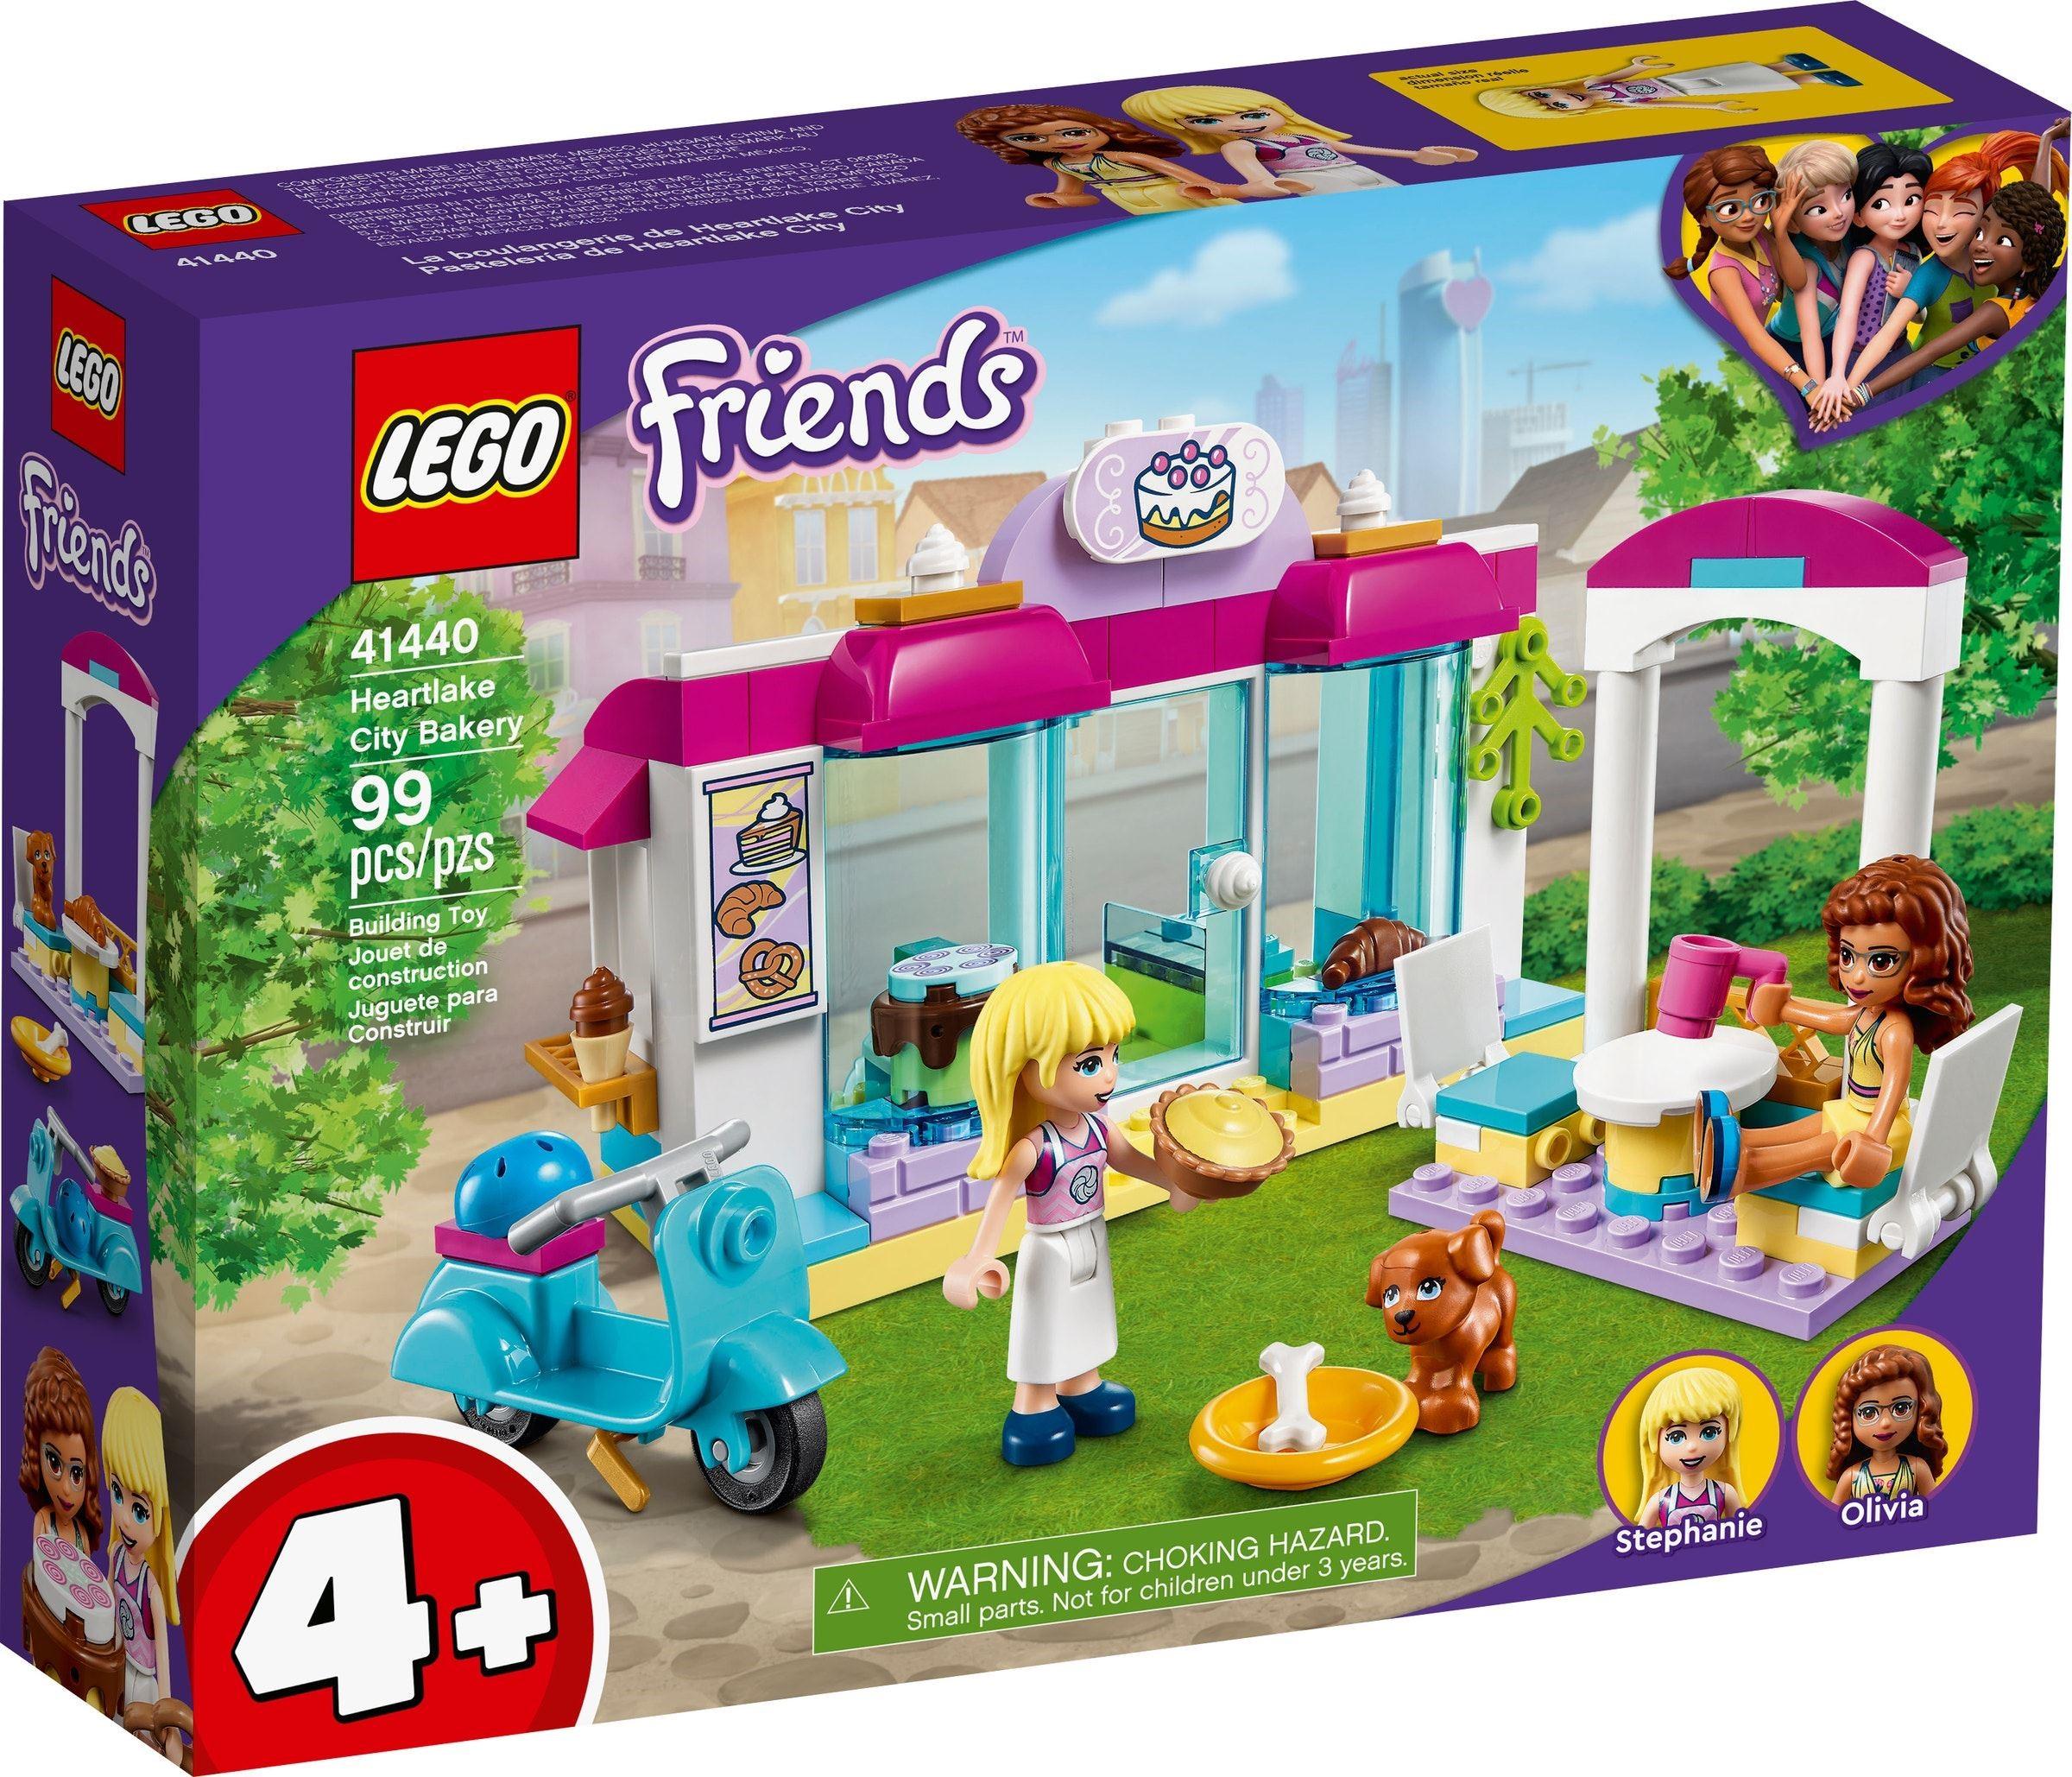 LEGO Friends - Heartlake City Bakery (41440)